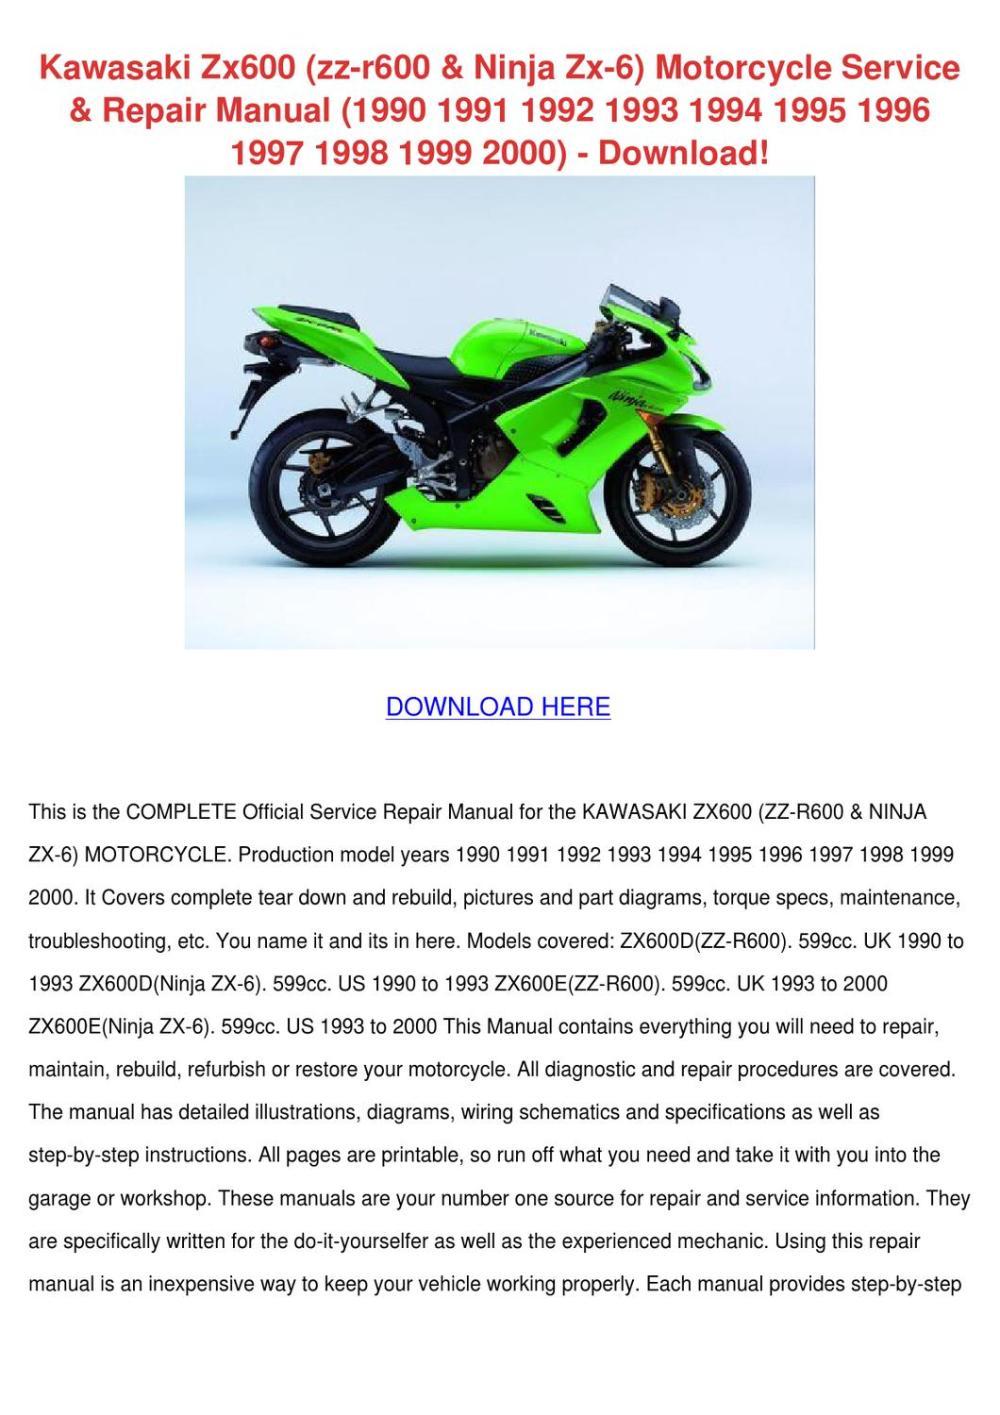 medium resolution of kawasaki zx600 zz r600 ninja zx 6 motorcycle